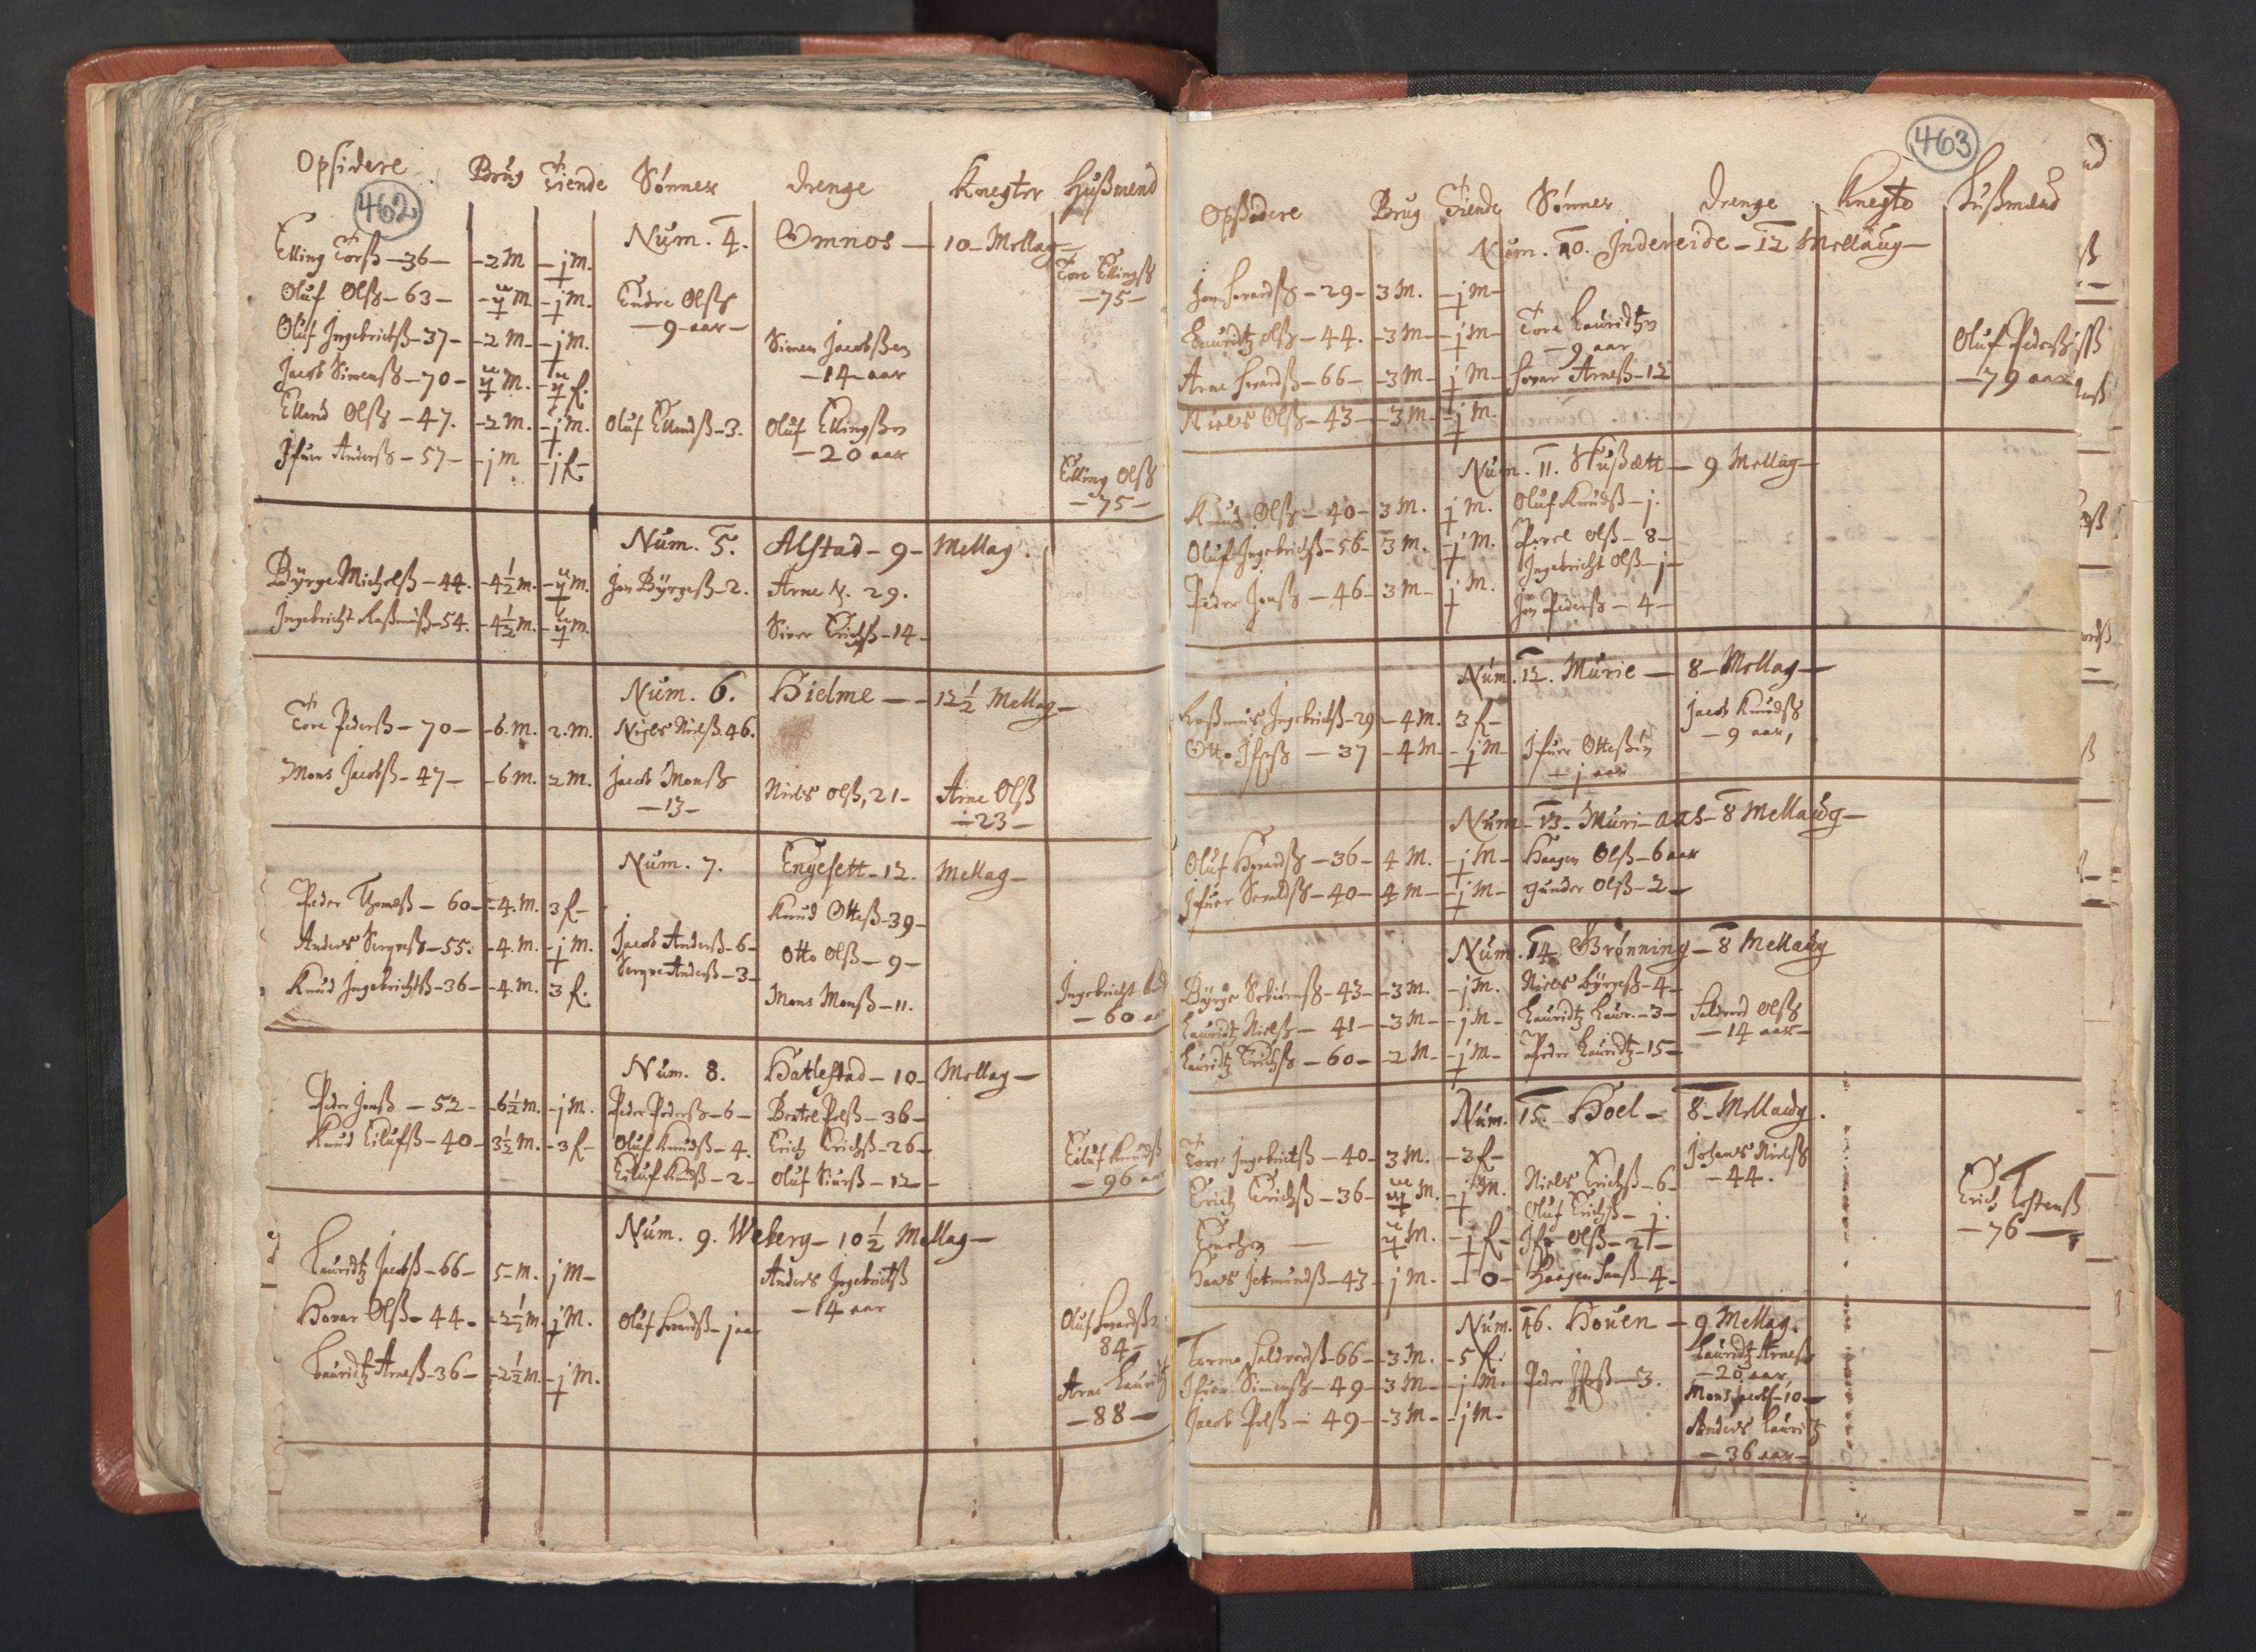 RA, Vicar's Census 1664-1666, no. 26: Sunnmøre deanery, 1664-1666, p. 462-463